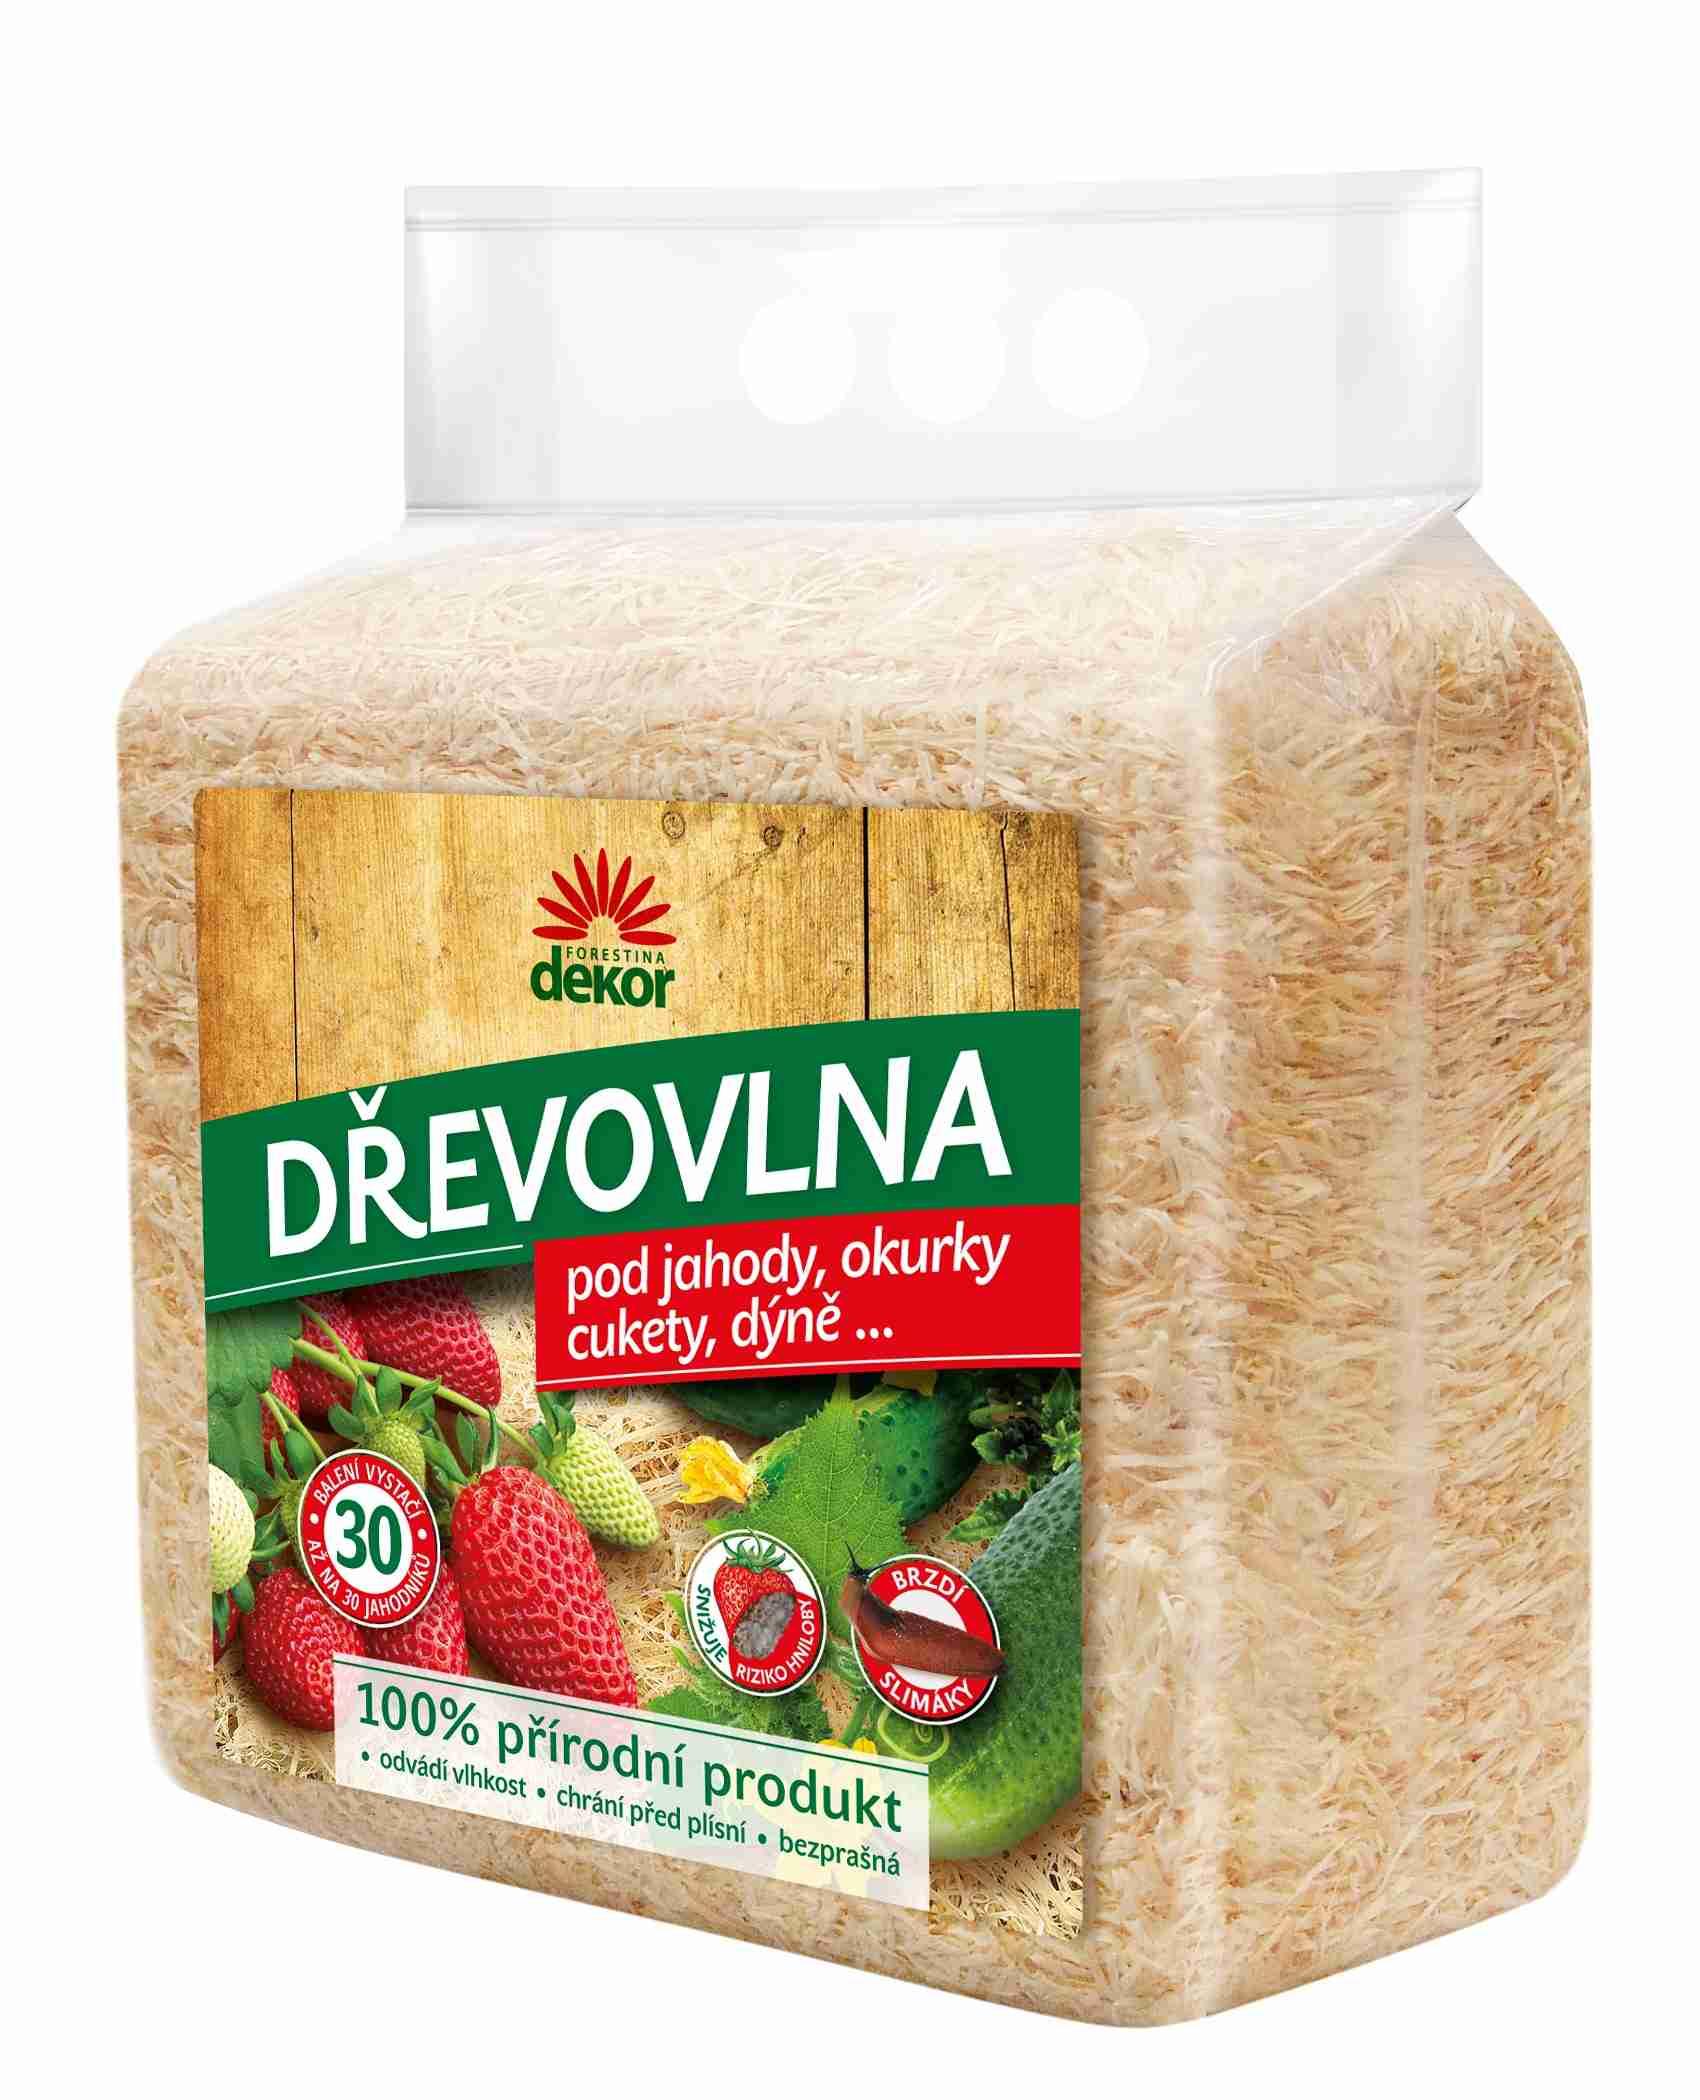 FORESTINA Dekor Dřevovlna (dřevitá vlna) 850g - snižuje riziko hniloby a brzdí slimáky